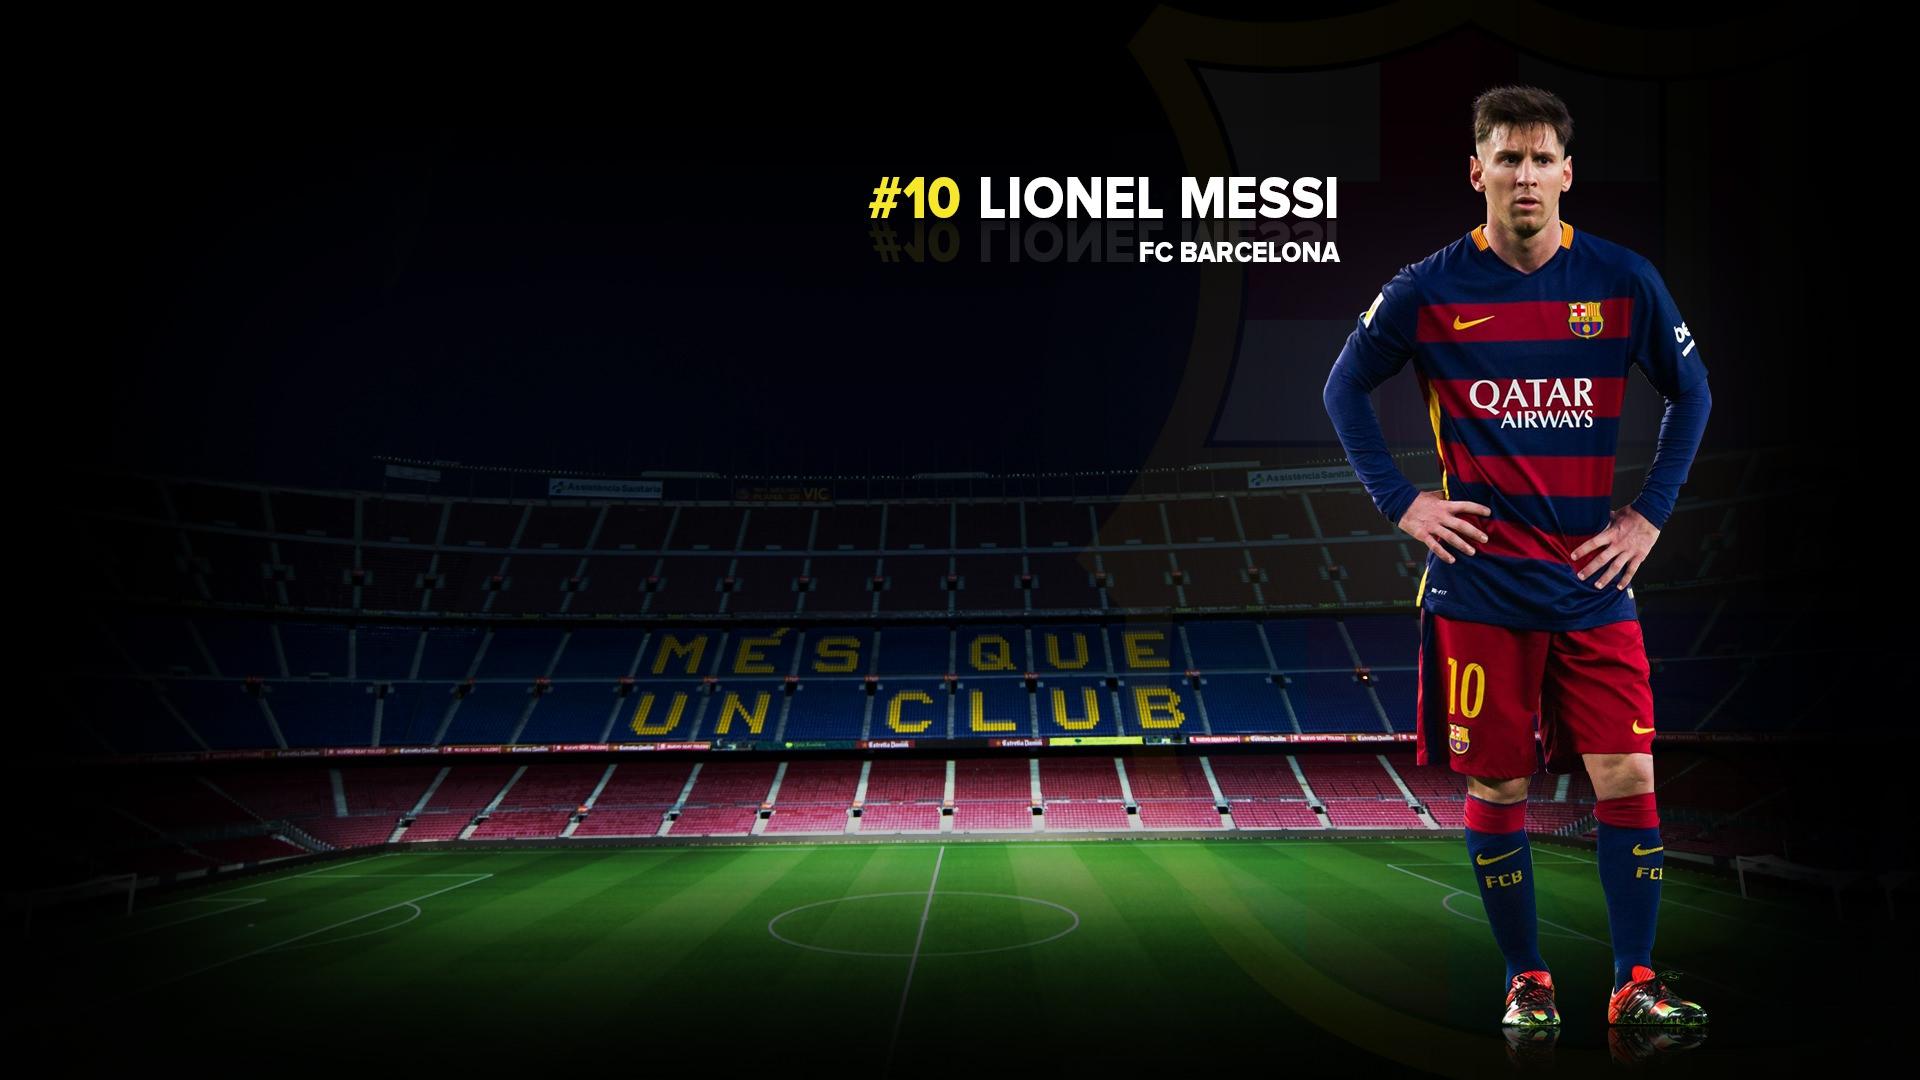 Wallpaper Hd Untuk Laptop Camp Nou Stadium Wallpaper Download Free Pixelstalk Net